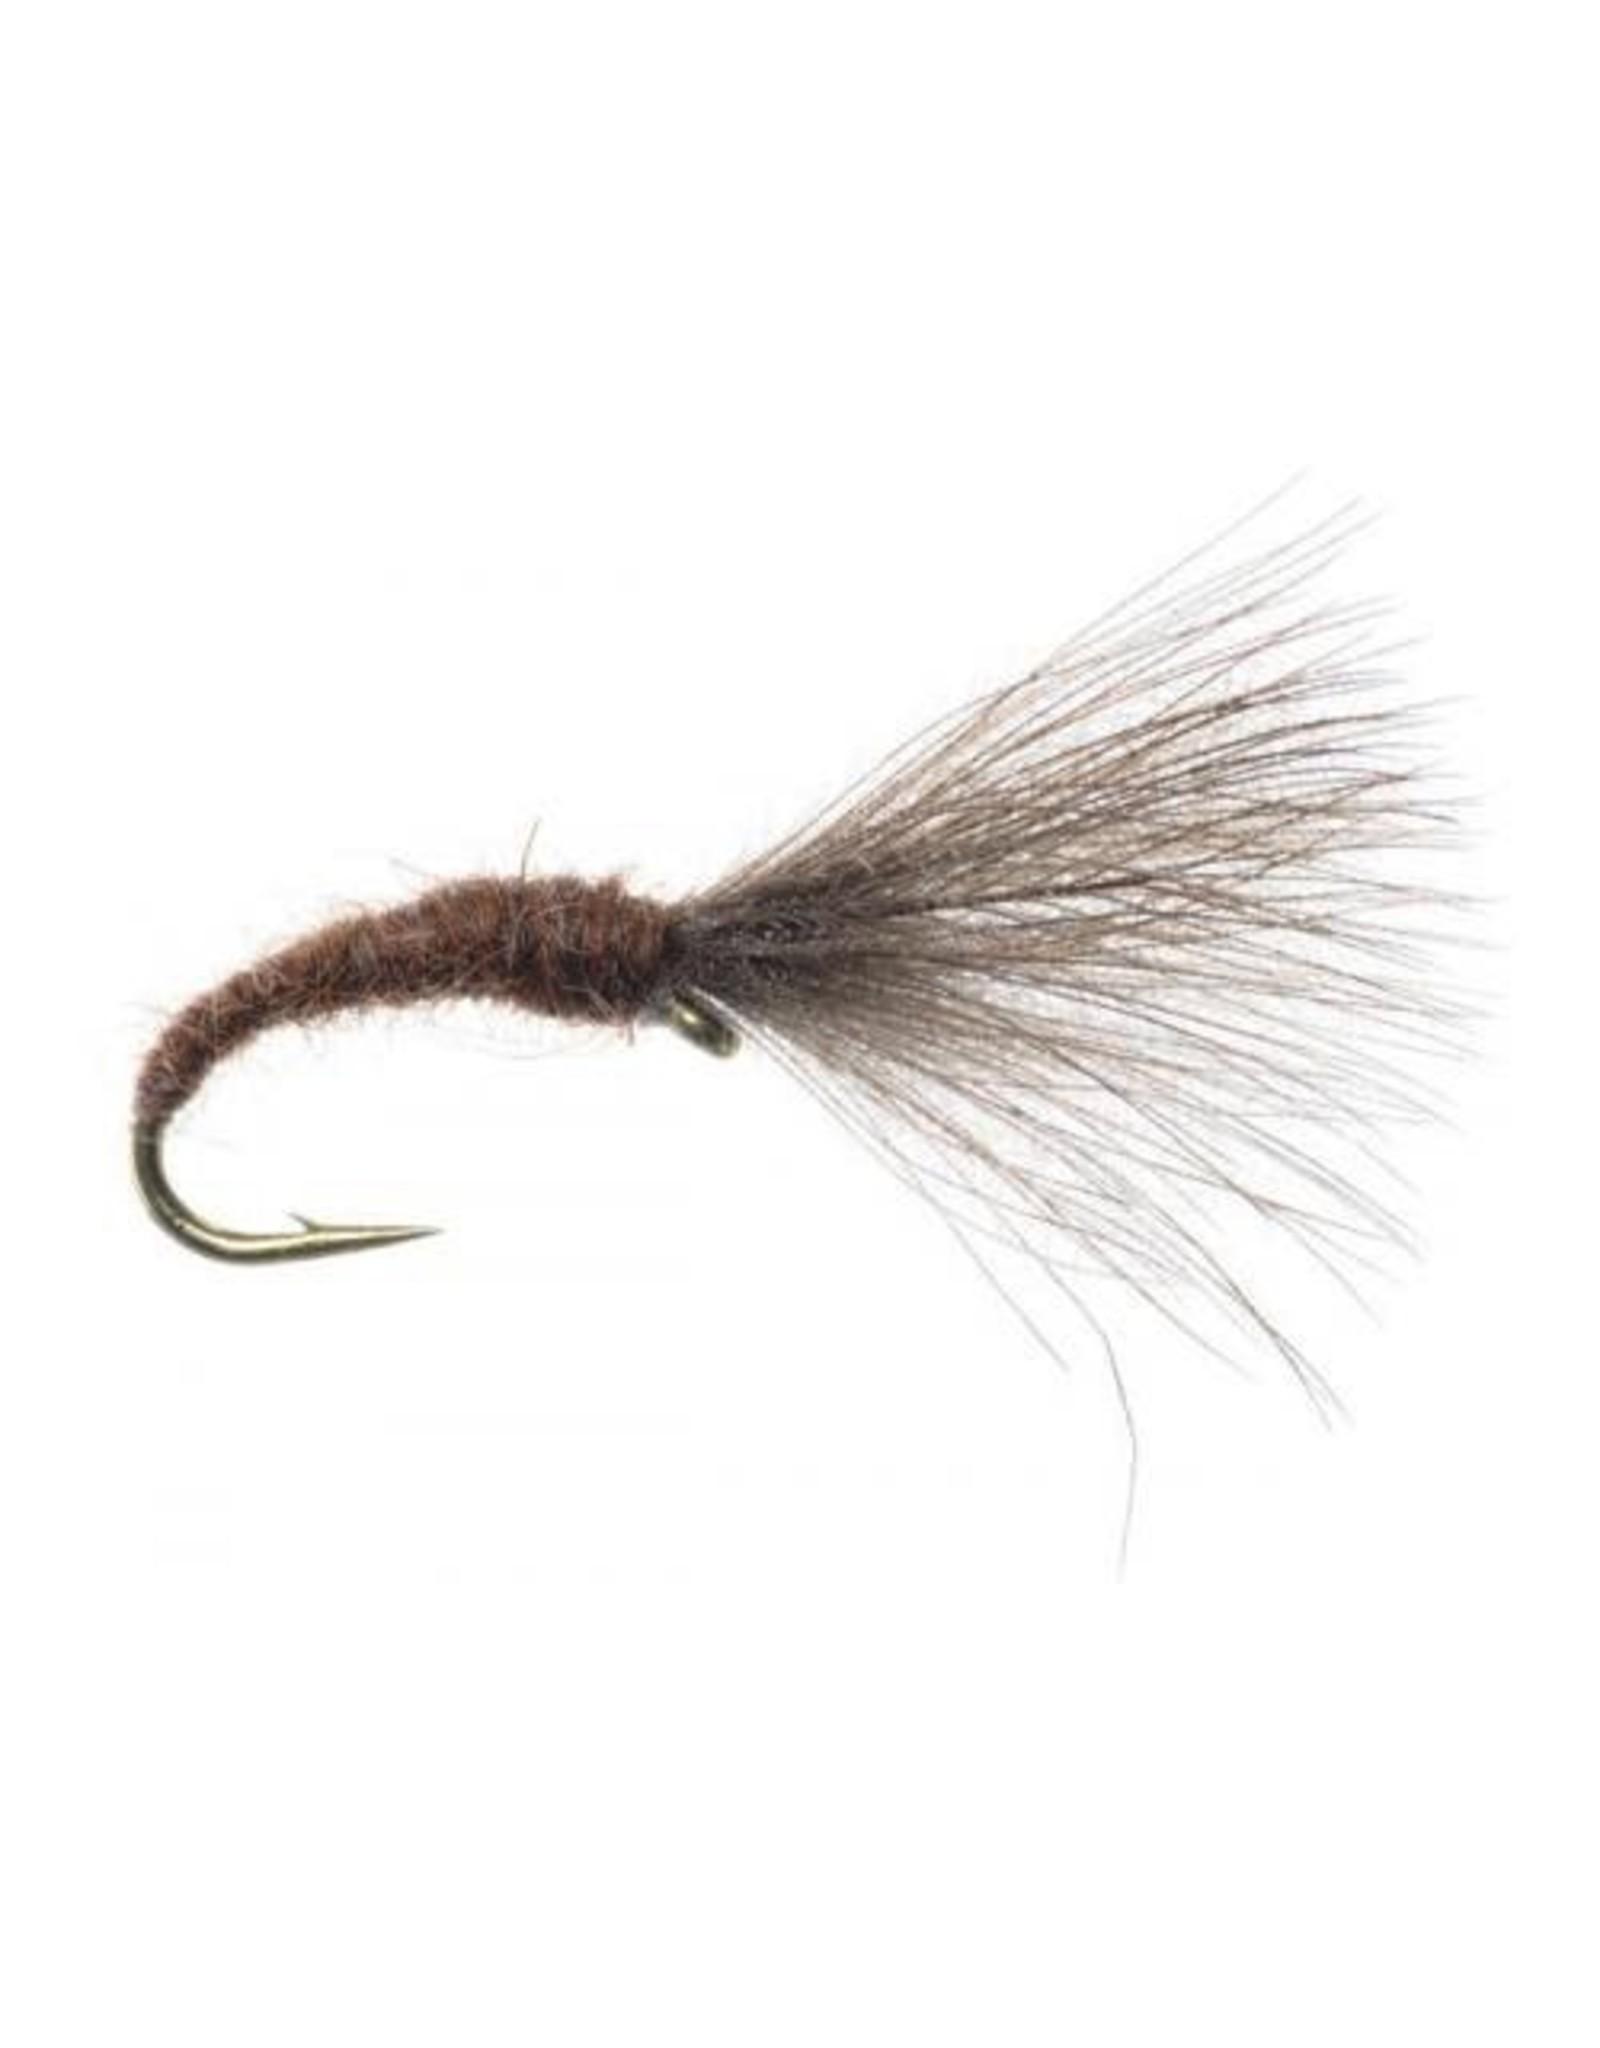 Umpqua Mole Fly (3 Pack)